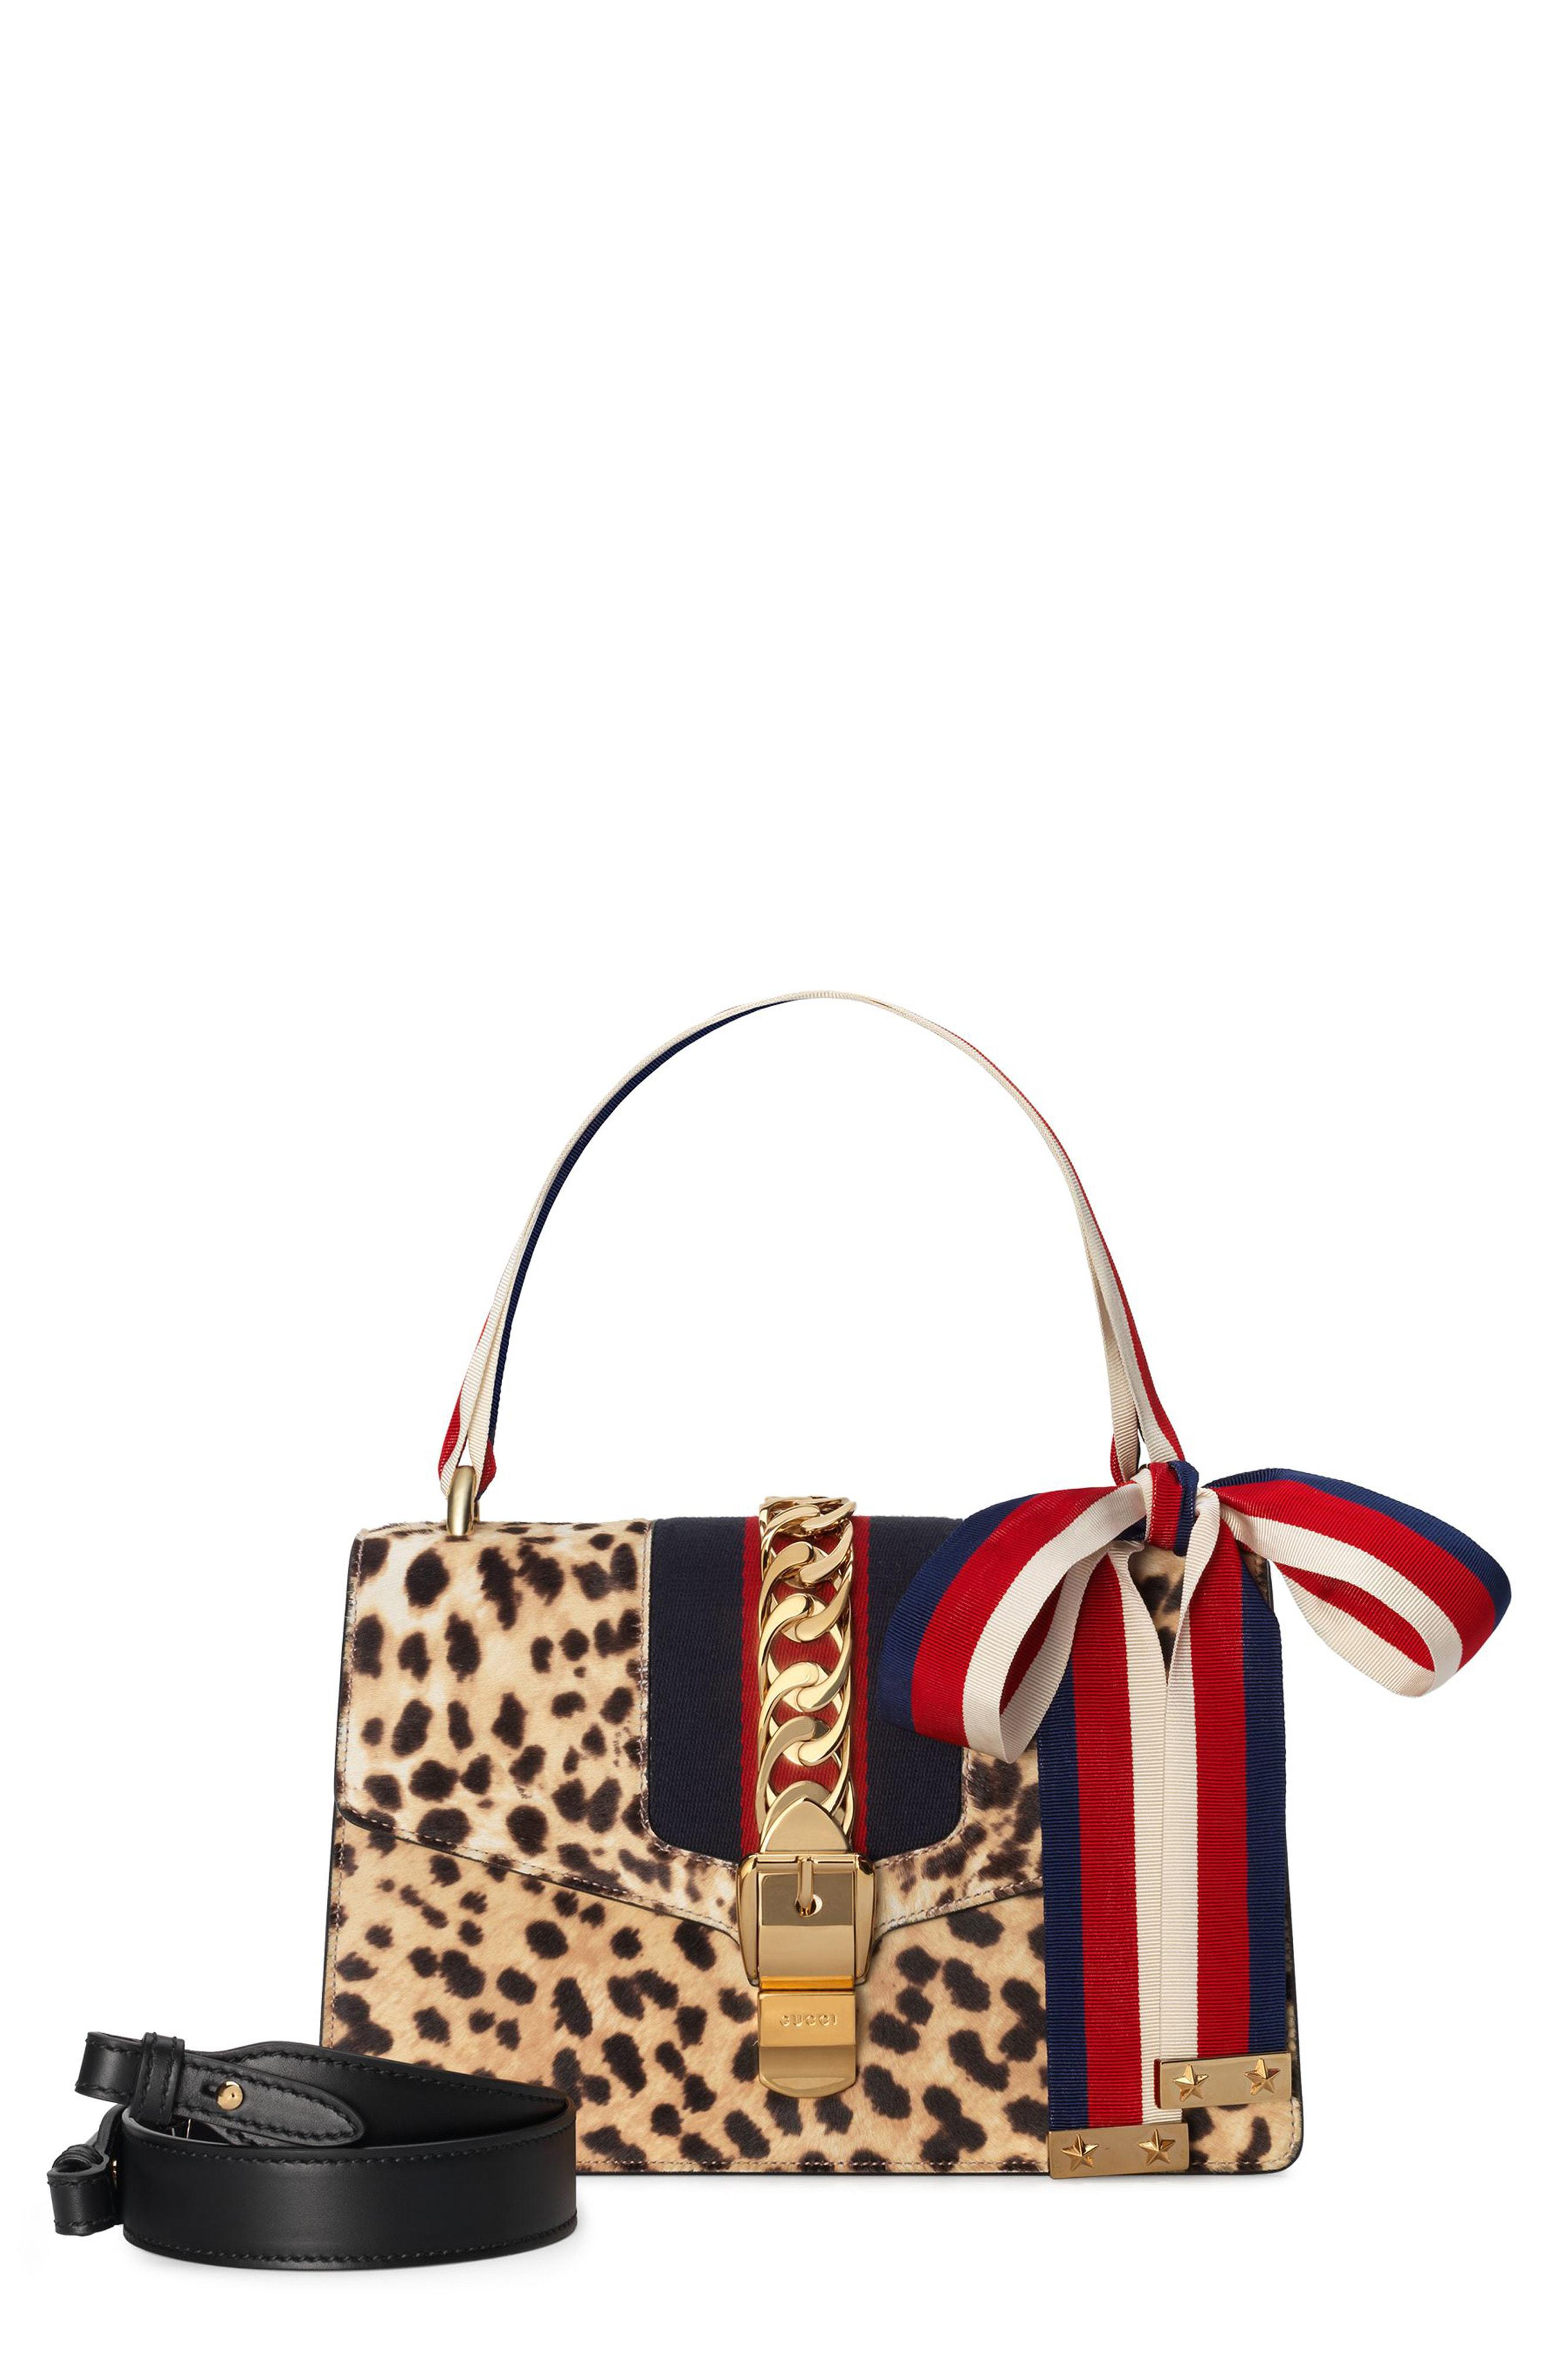 cd9dd42f2f4fa4 Gucci Small Sylvie Genuine Calf Hair Top Handle Bag in Natural - Lyst